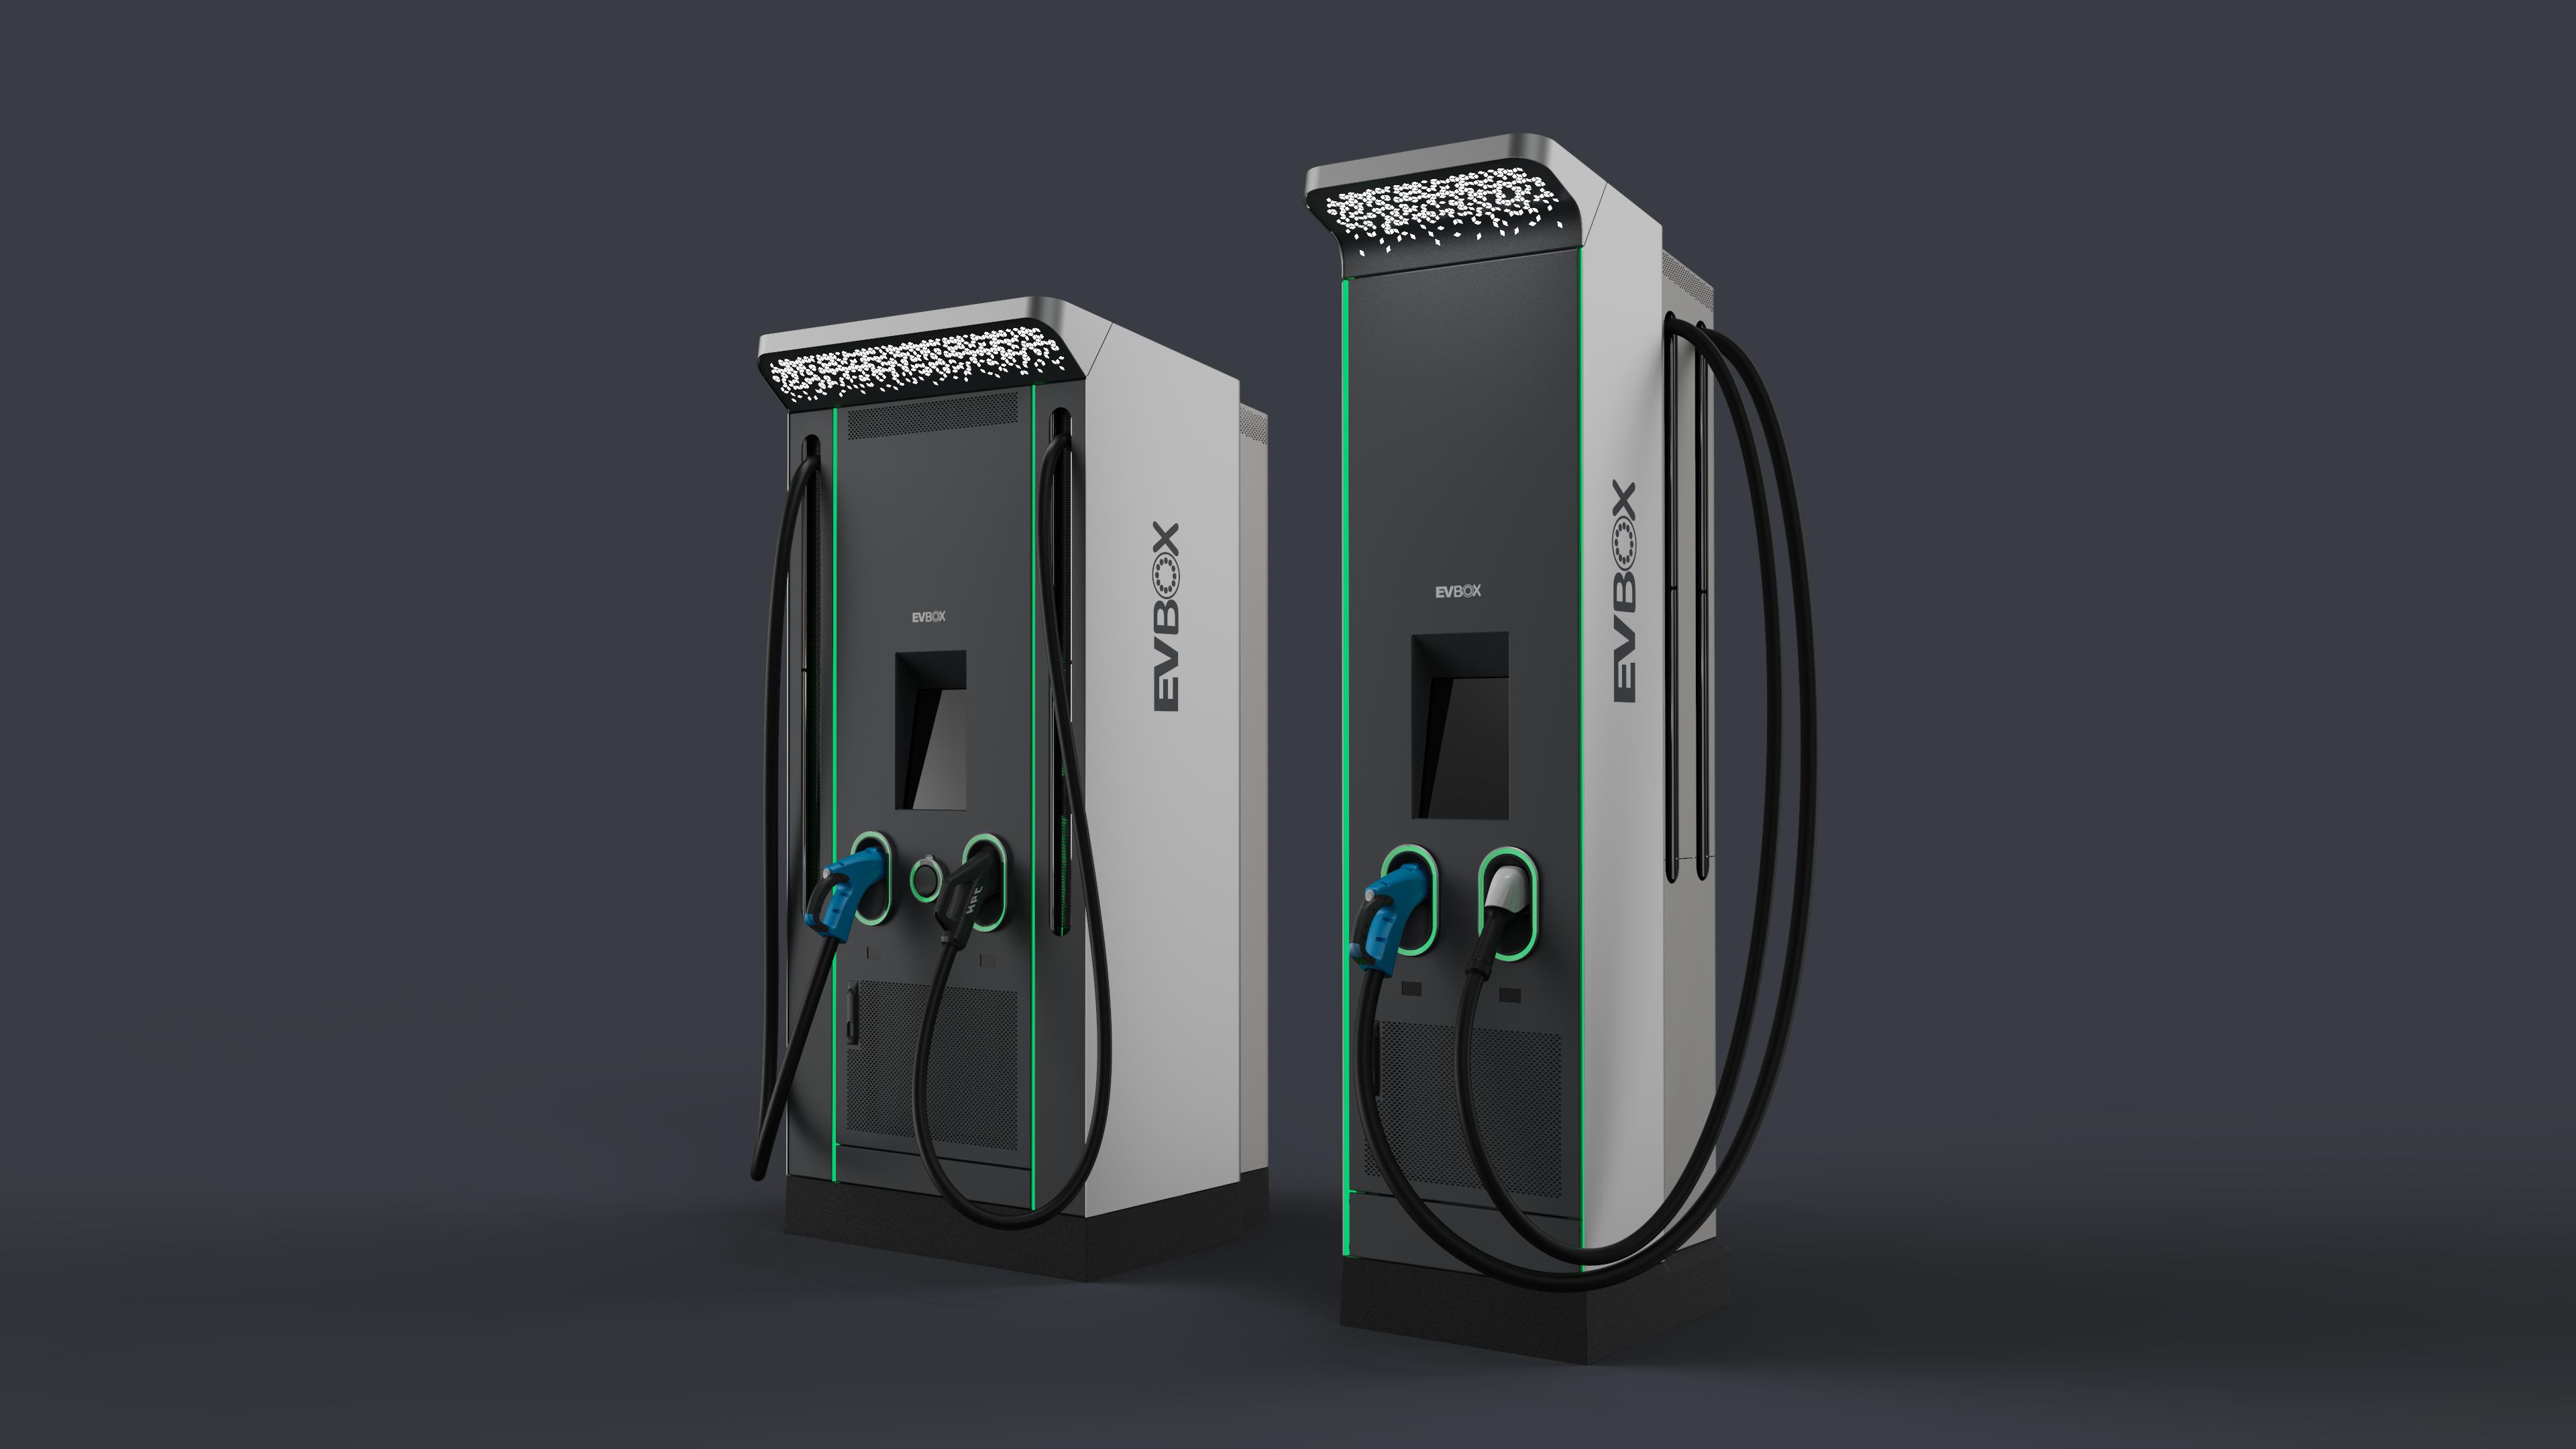 EVBox Troniq 100 EVBox Ultroniq launch DC chargers